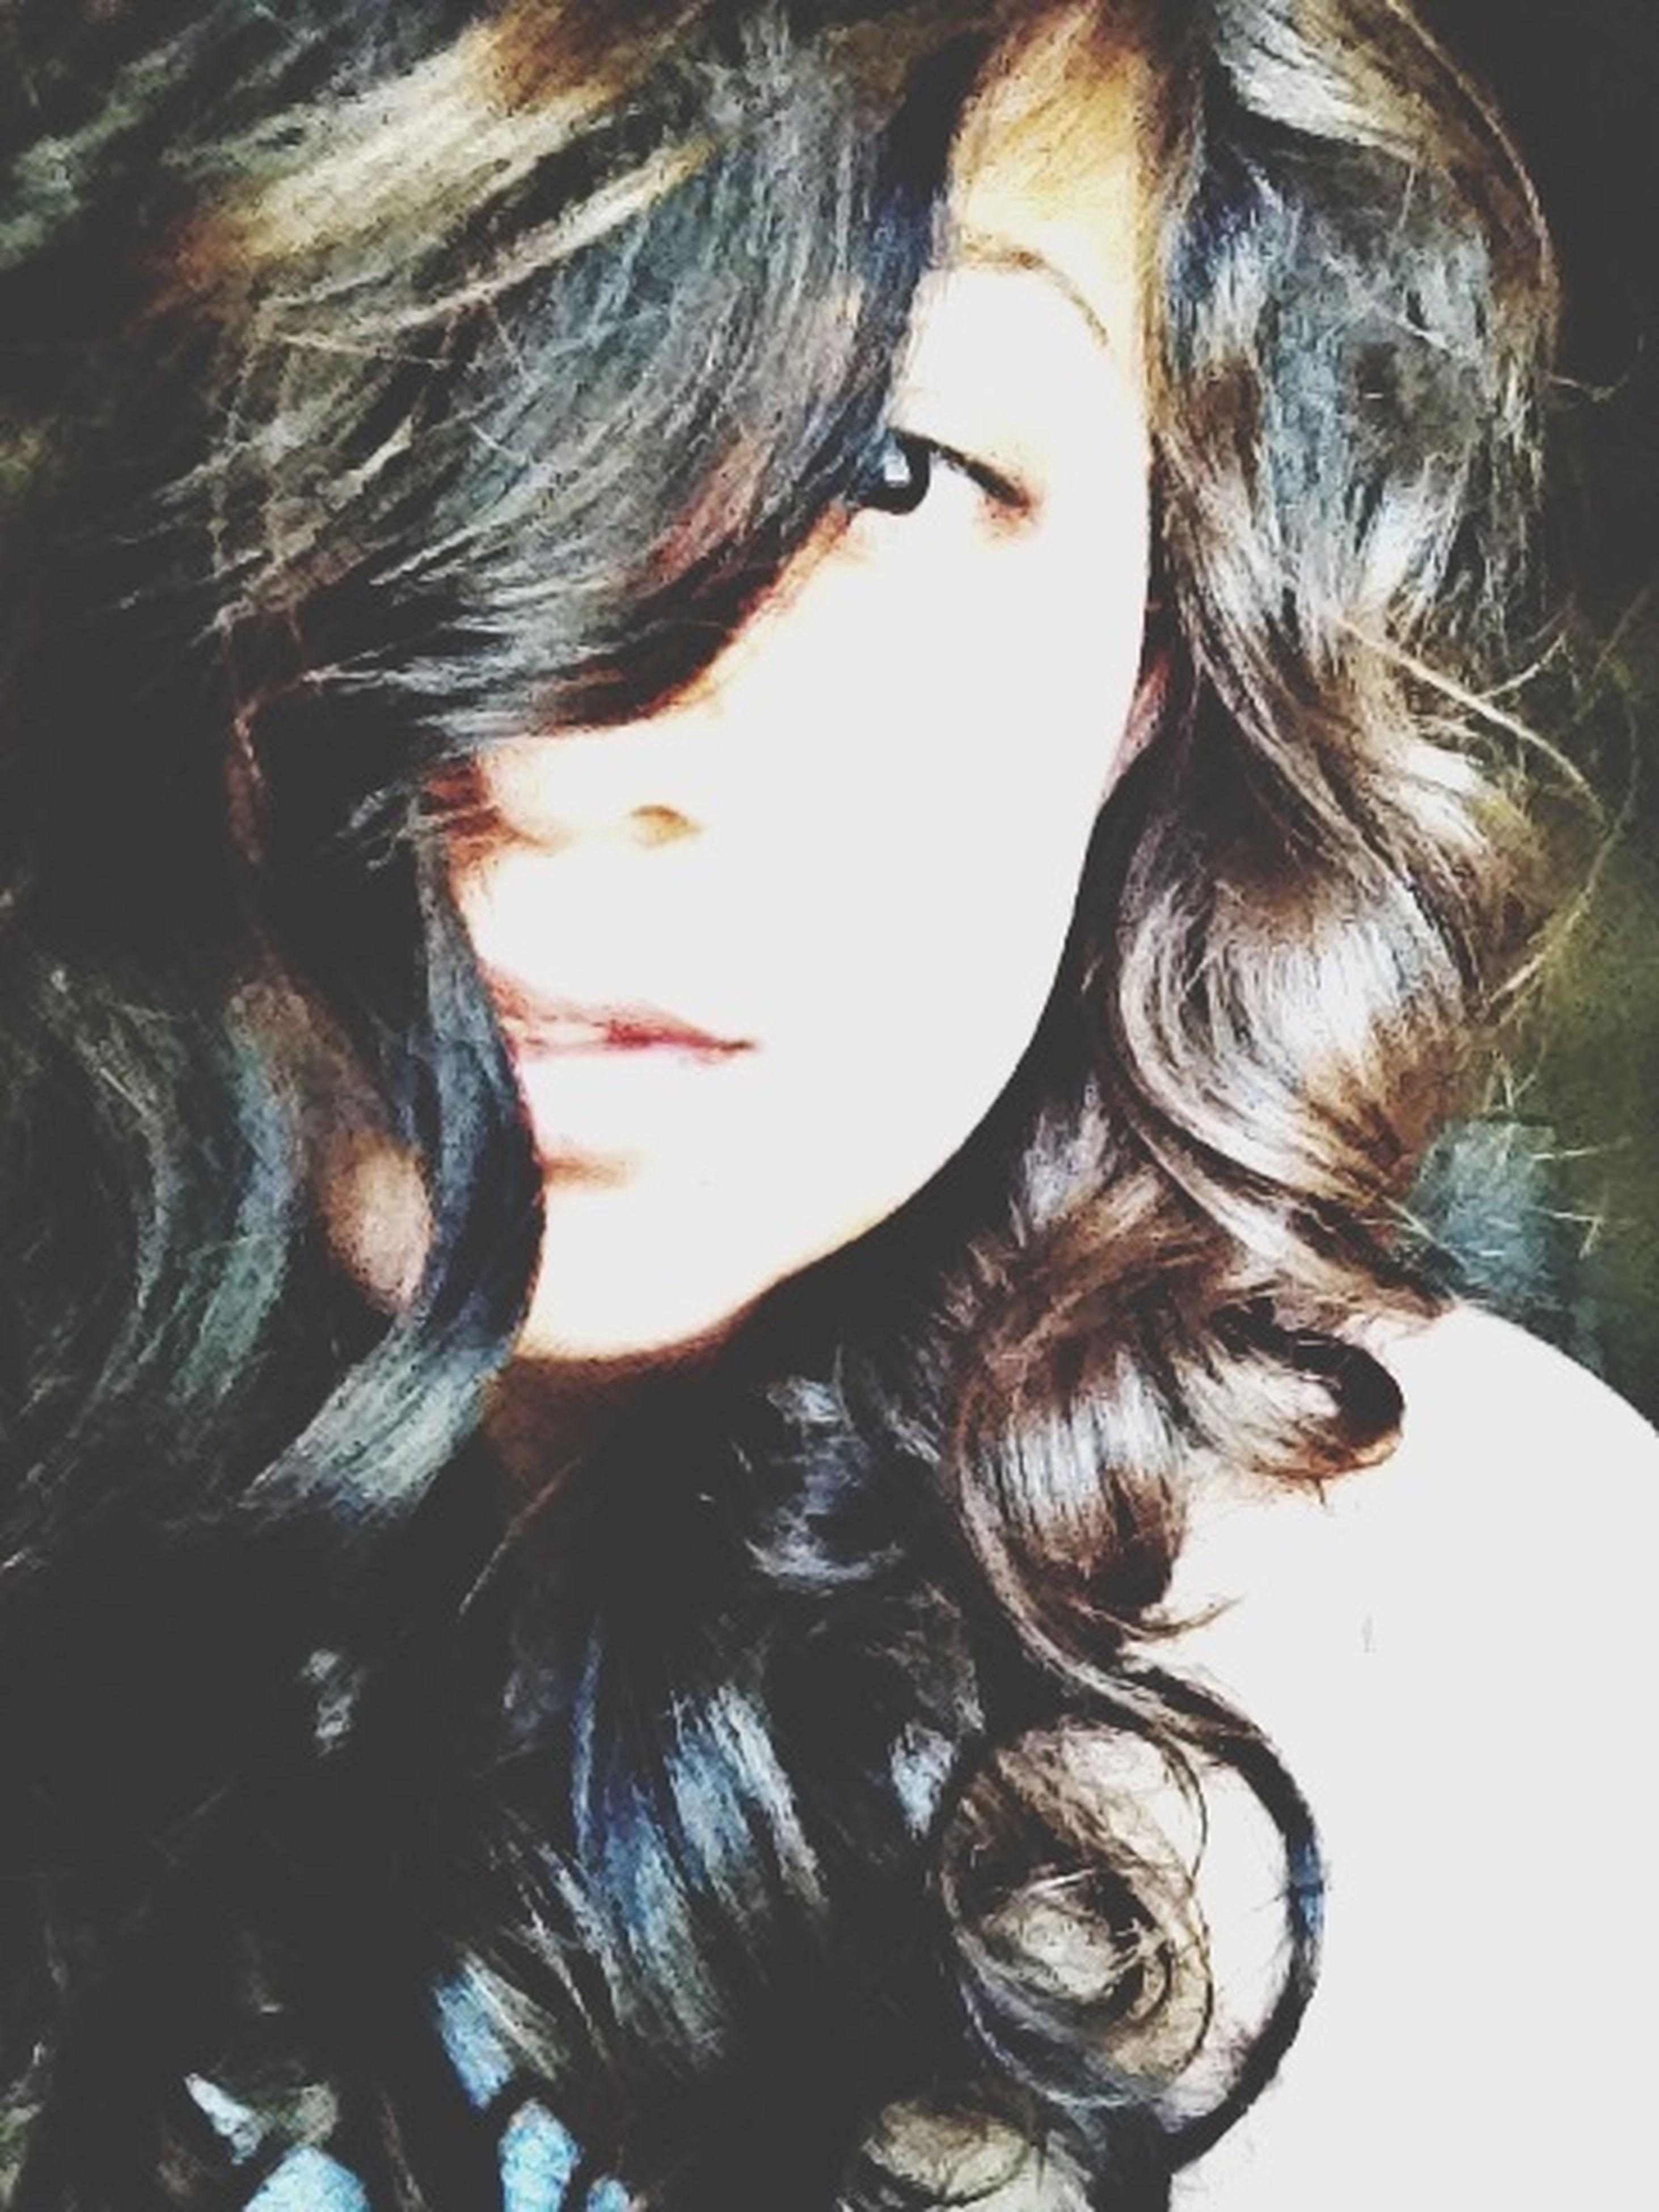 long hair, young women, lifestyles, young adult, headshot, leisure activity, person, blond hair, brown hair, human hair, indoors, close-up, black hair, medium-length hair, beauty, femininity